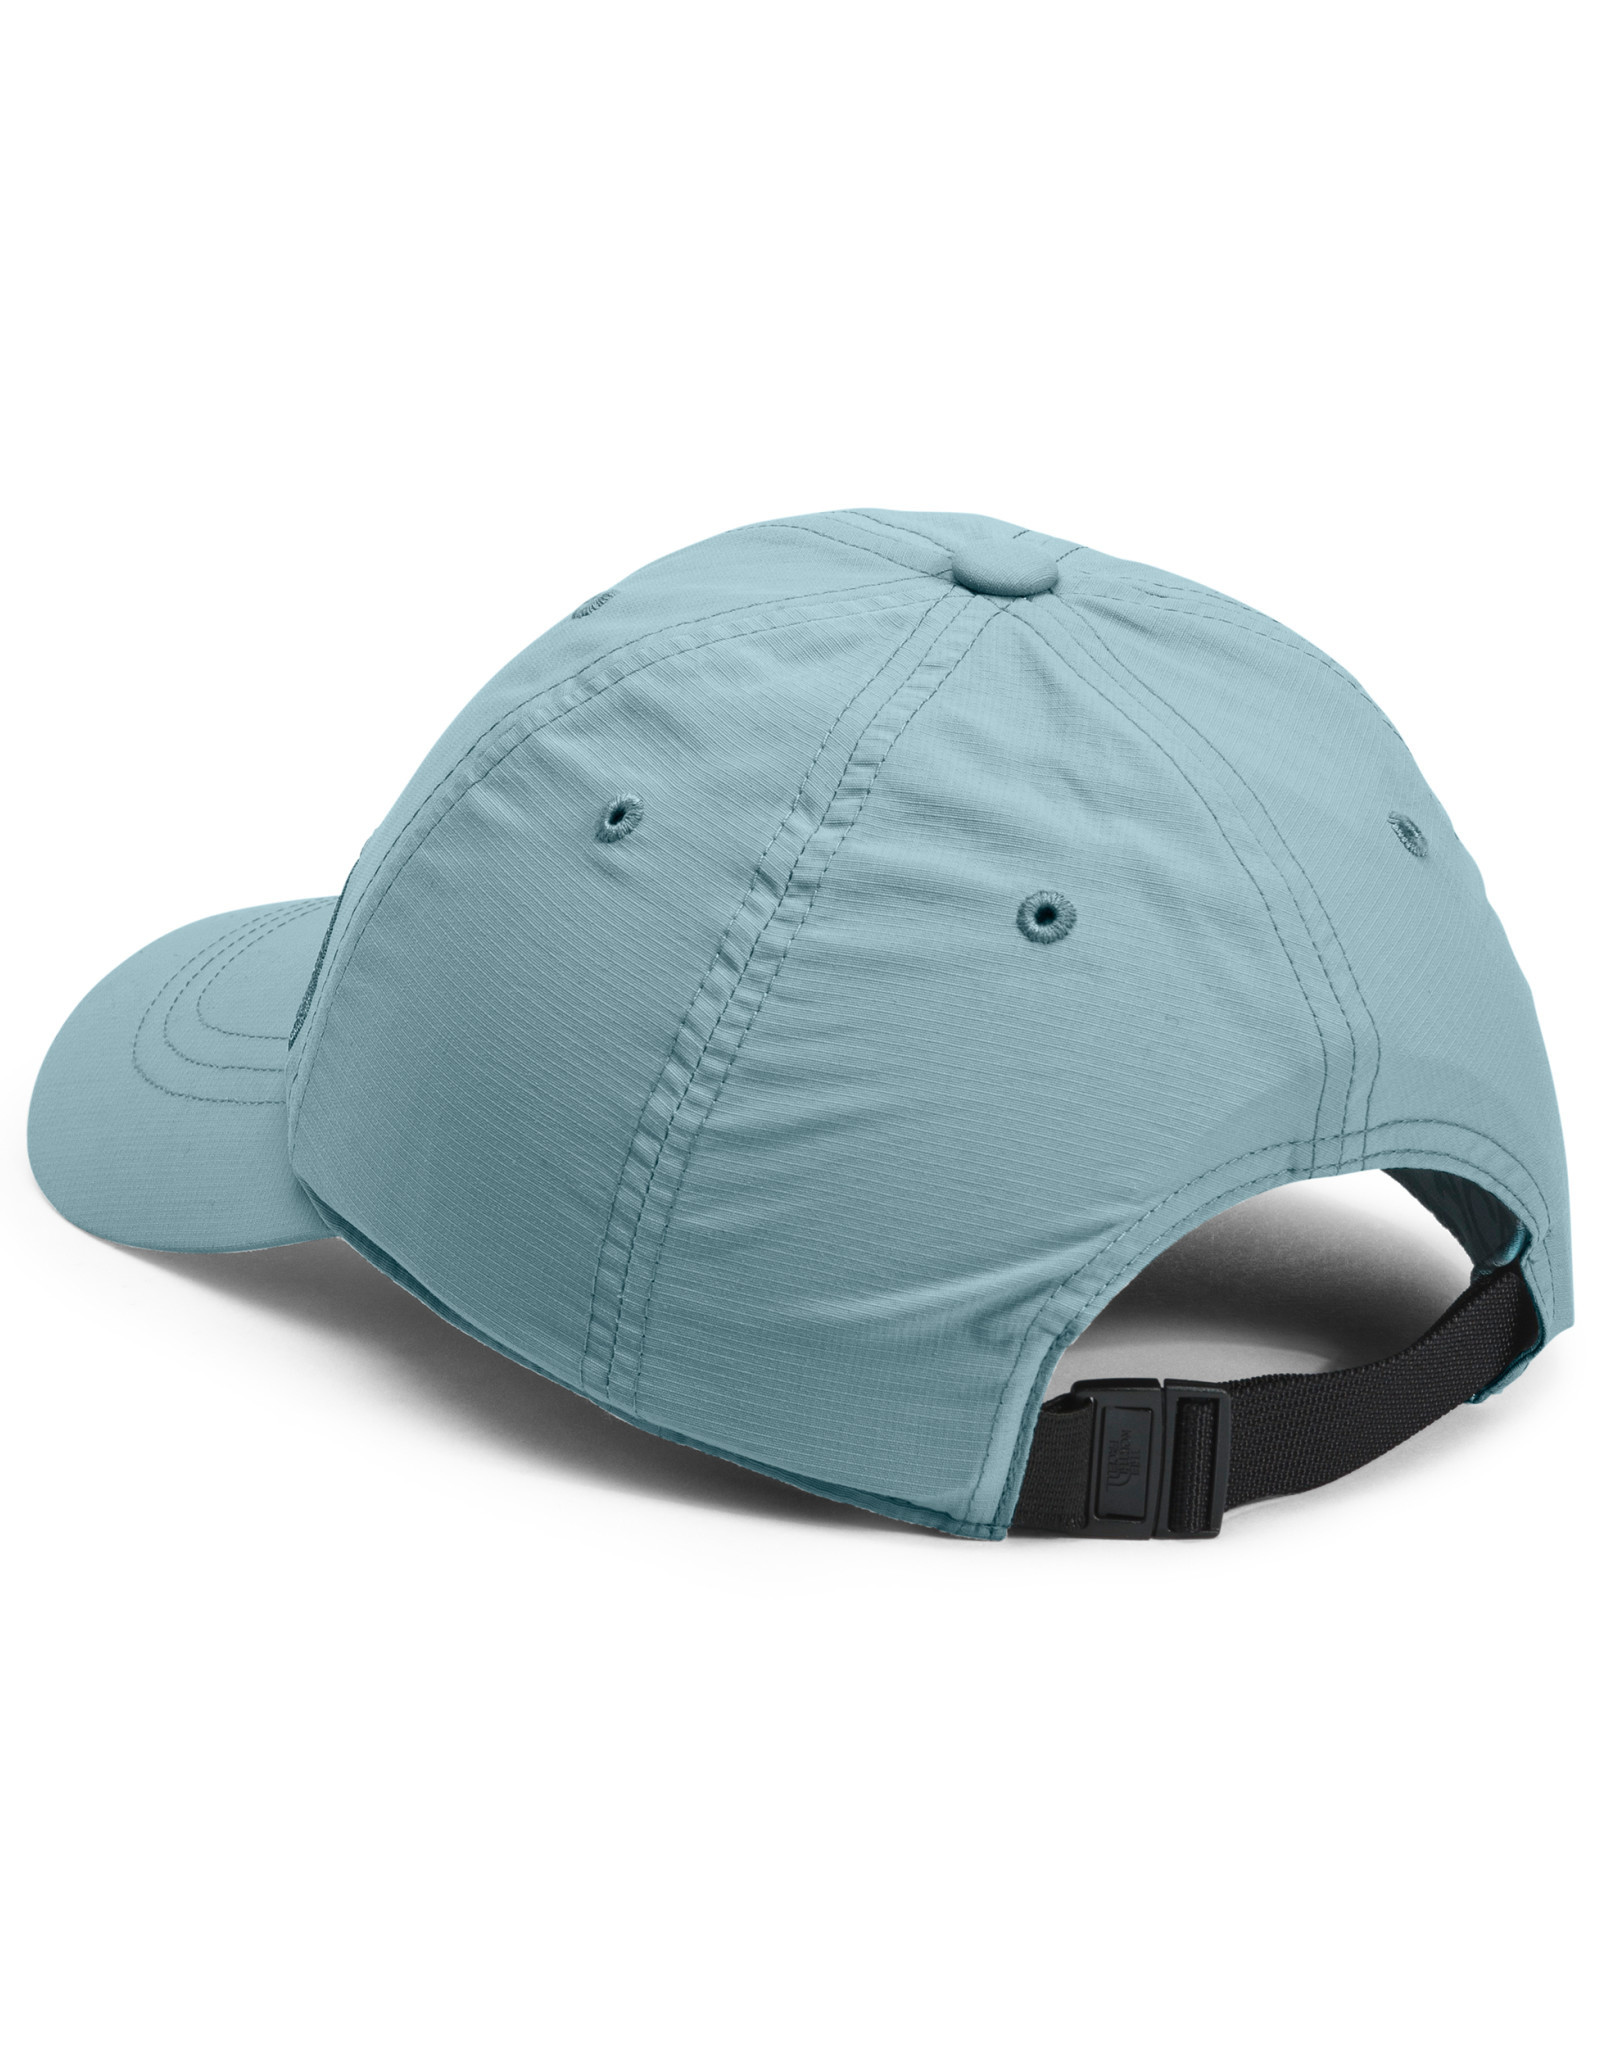 The North Face Women's Horizon Hat -S2021